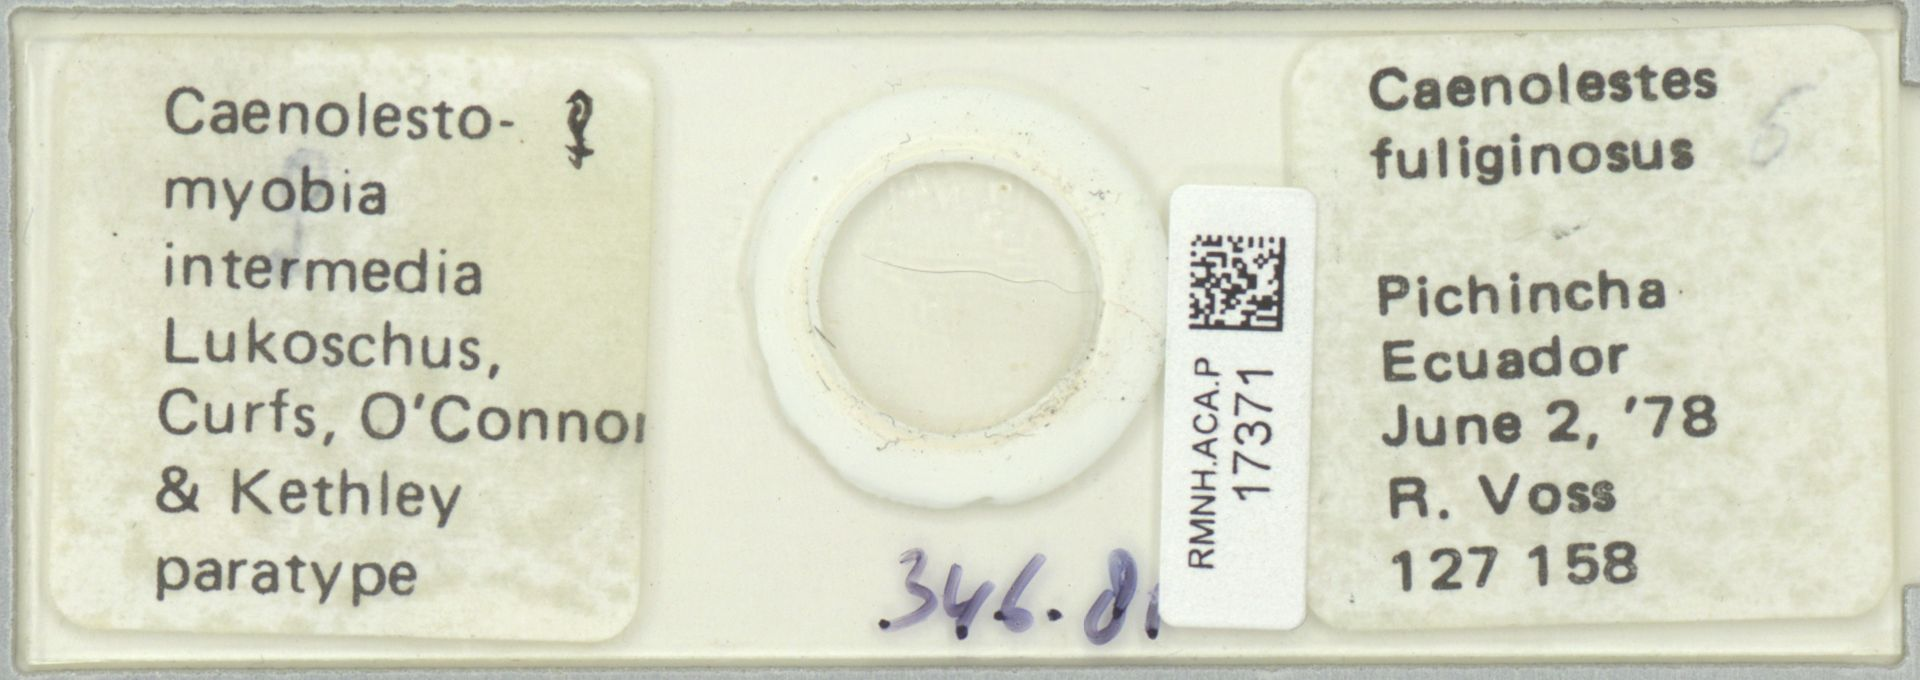 RMNH.ACA.P.17371 | Caenolestomyobia intermedia